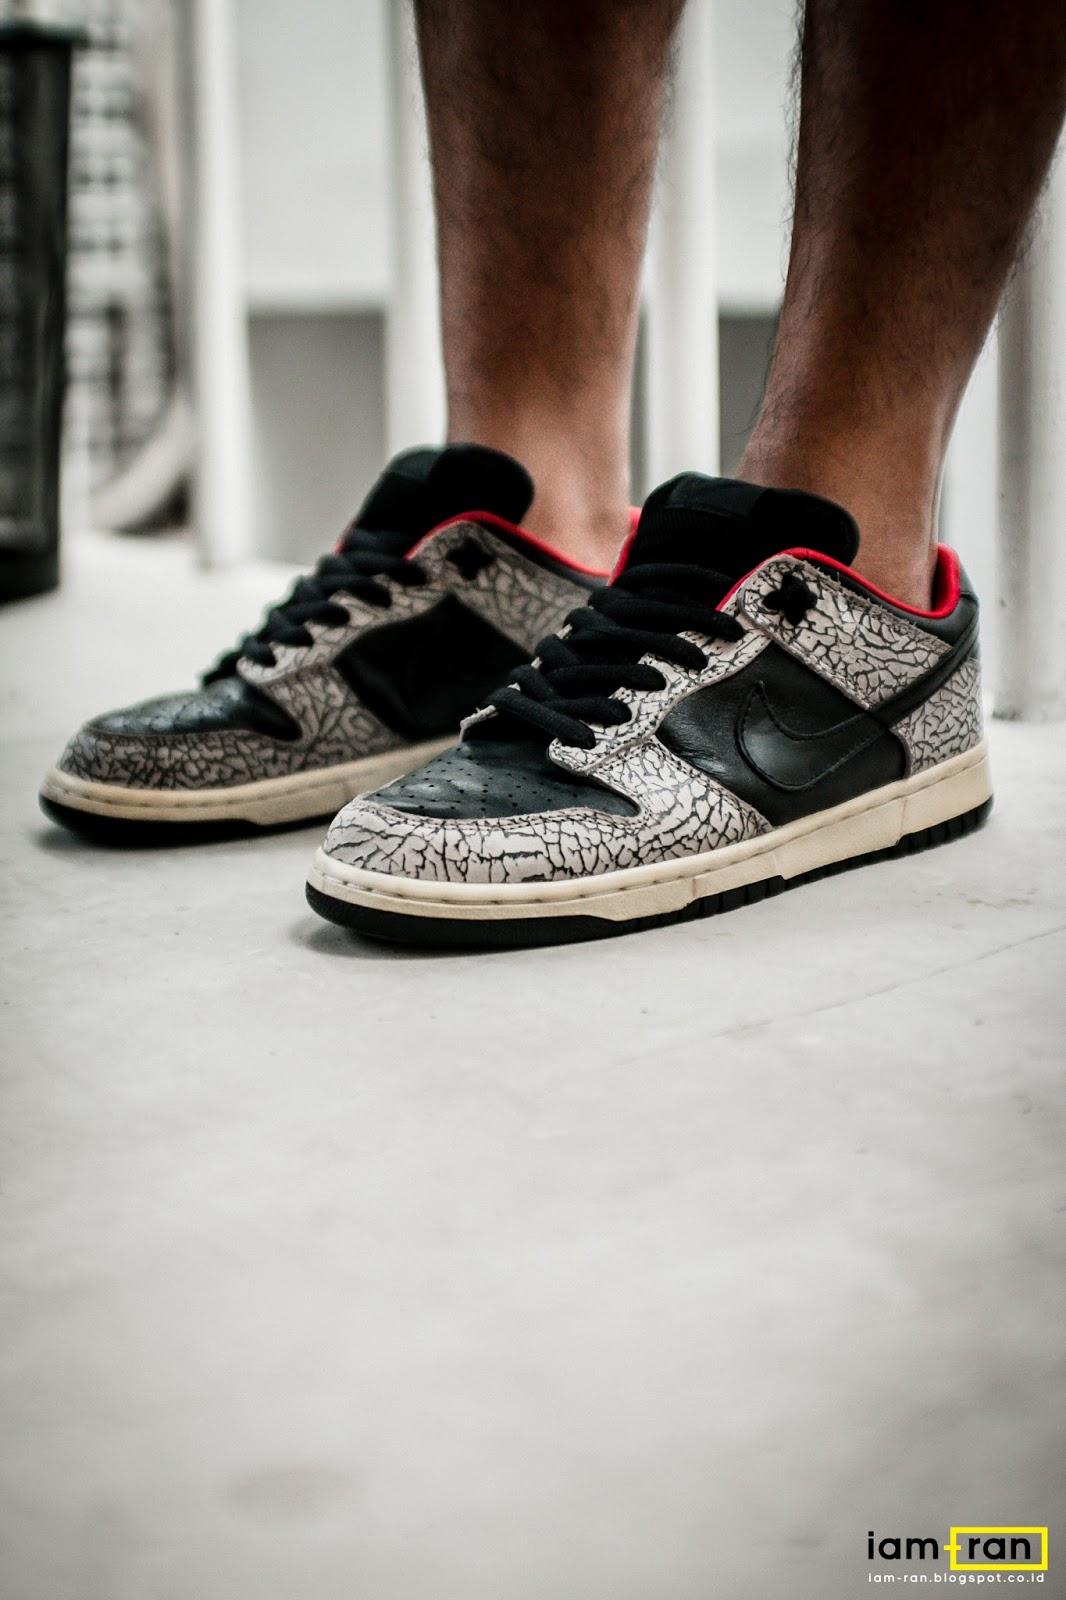 e69c676891de5a ... Anggie Raditya on feet. Sneakers Nike SB Dunk Low X Supreme. Photo by  iam ...